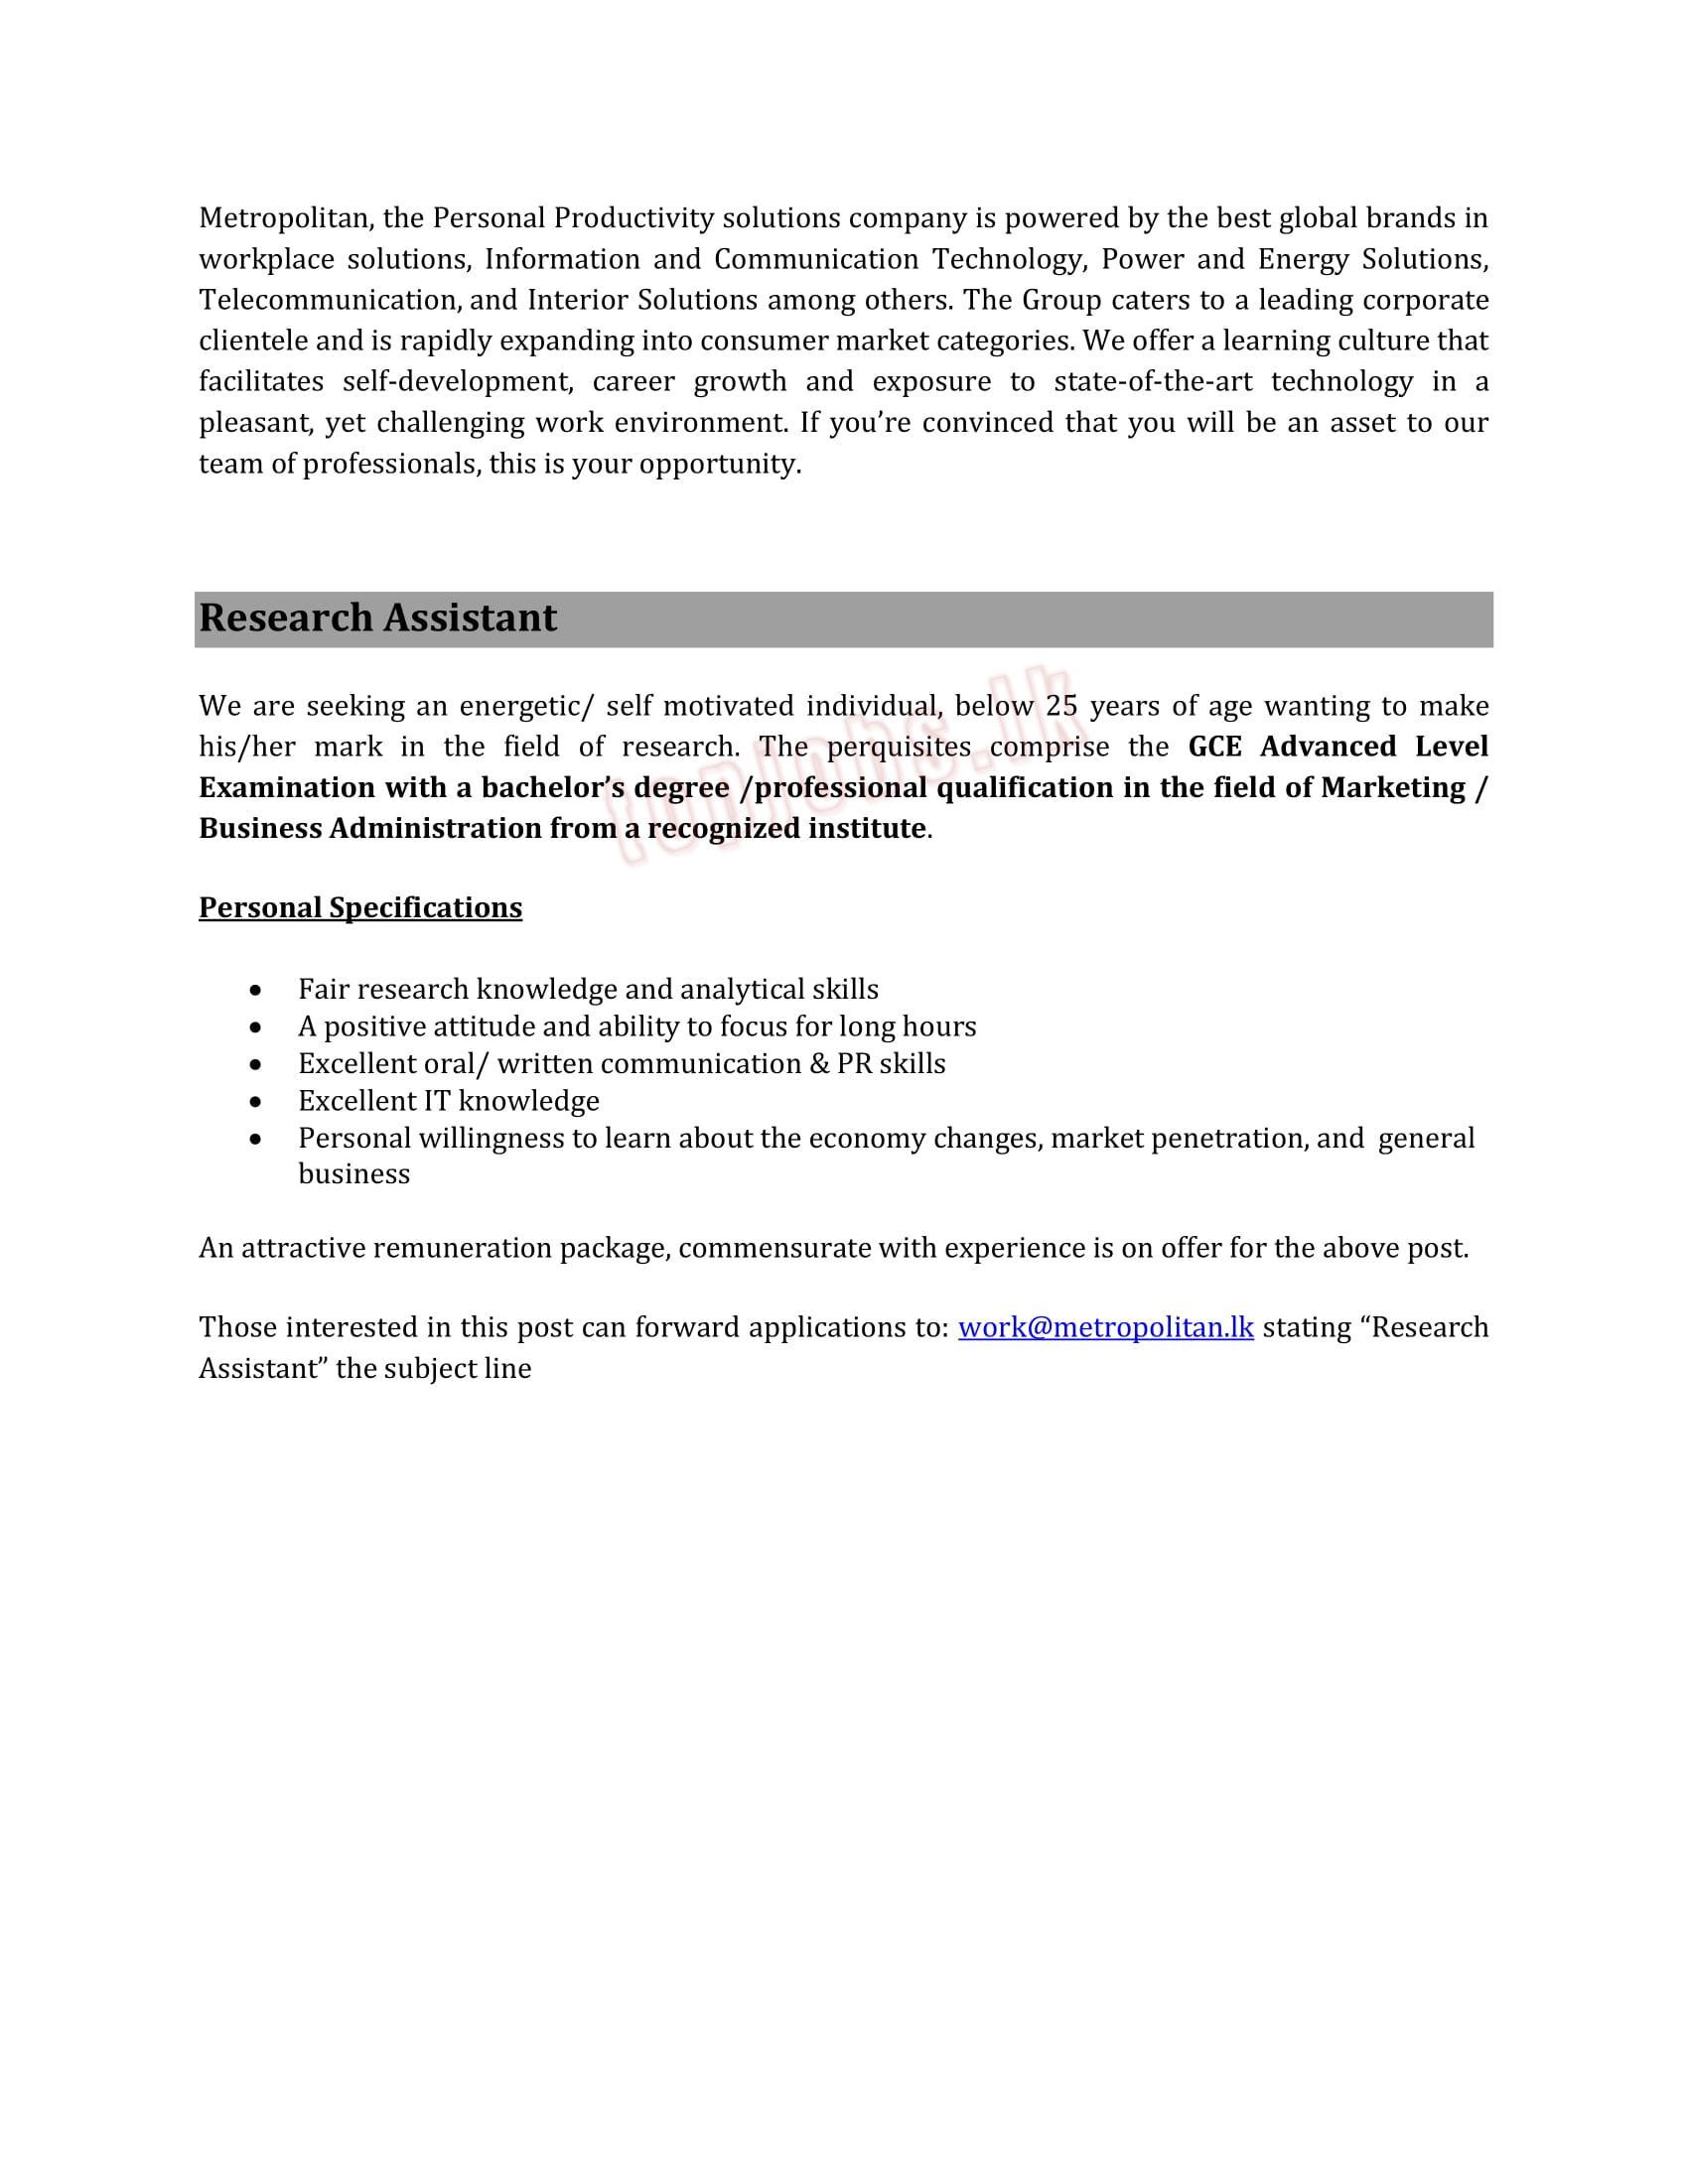 Research Assistant (1) Jobs in Sri Lanka - 0 yrs @Metropolitan Group